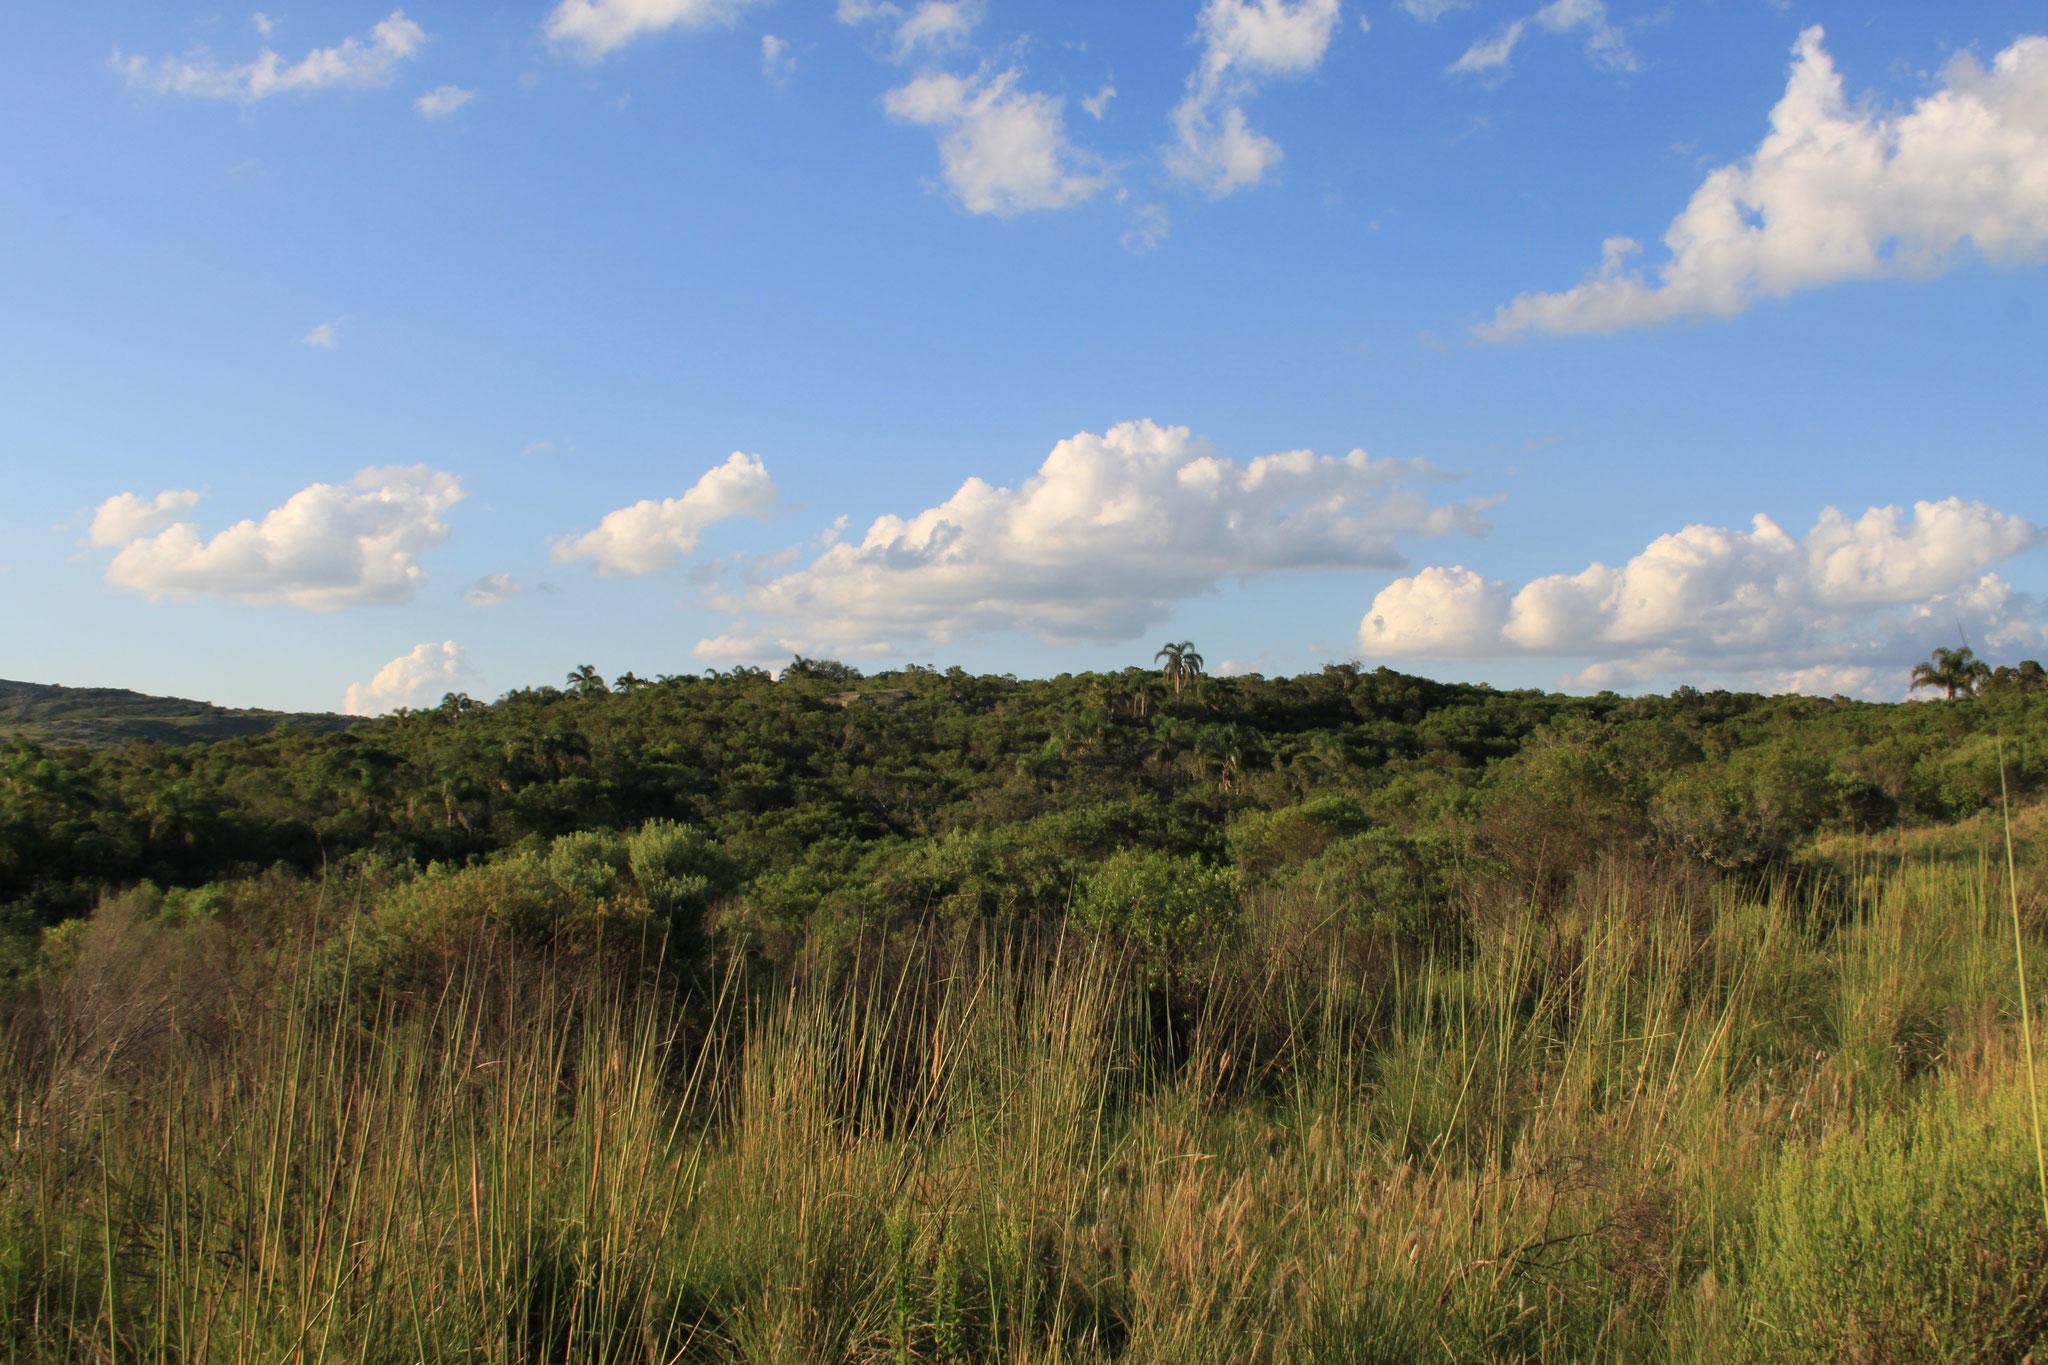 Das Hinterland der Region Maldonado